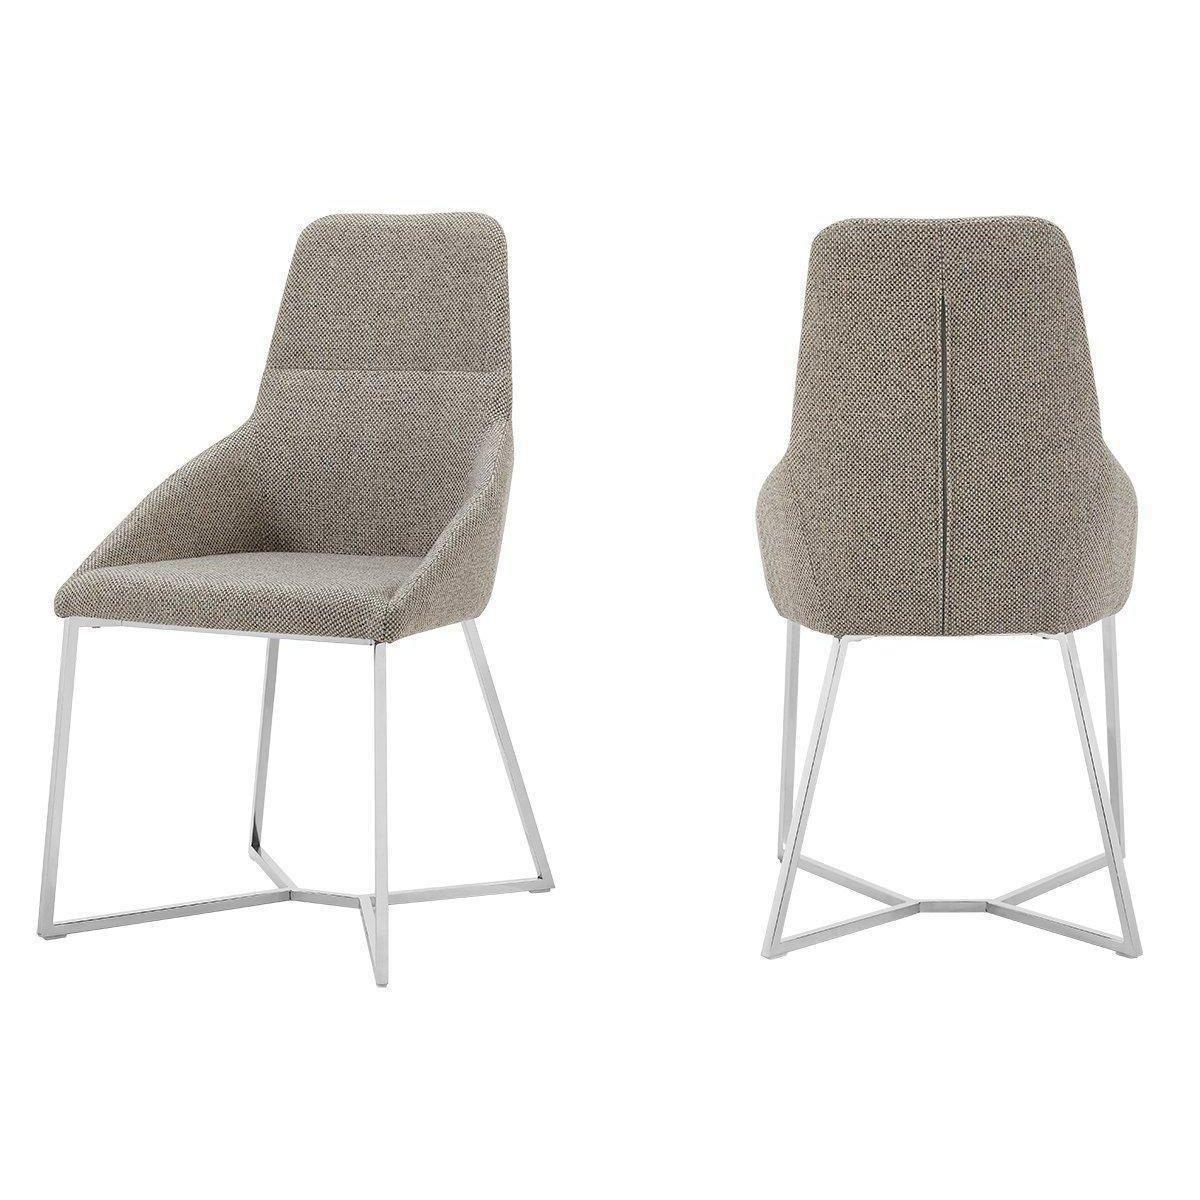 Stark Modern Light Grey Fabric Dining Chair Set Of 2 Fabric